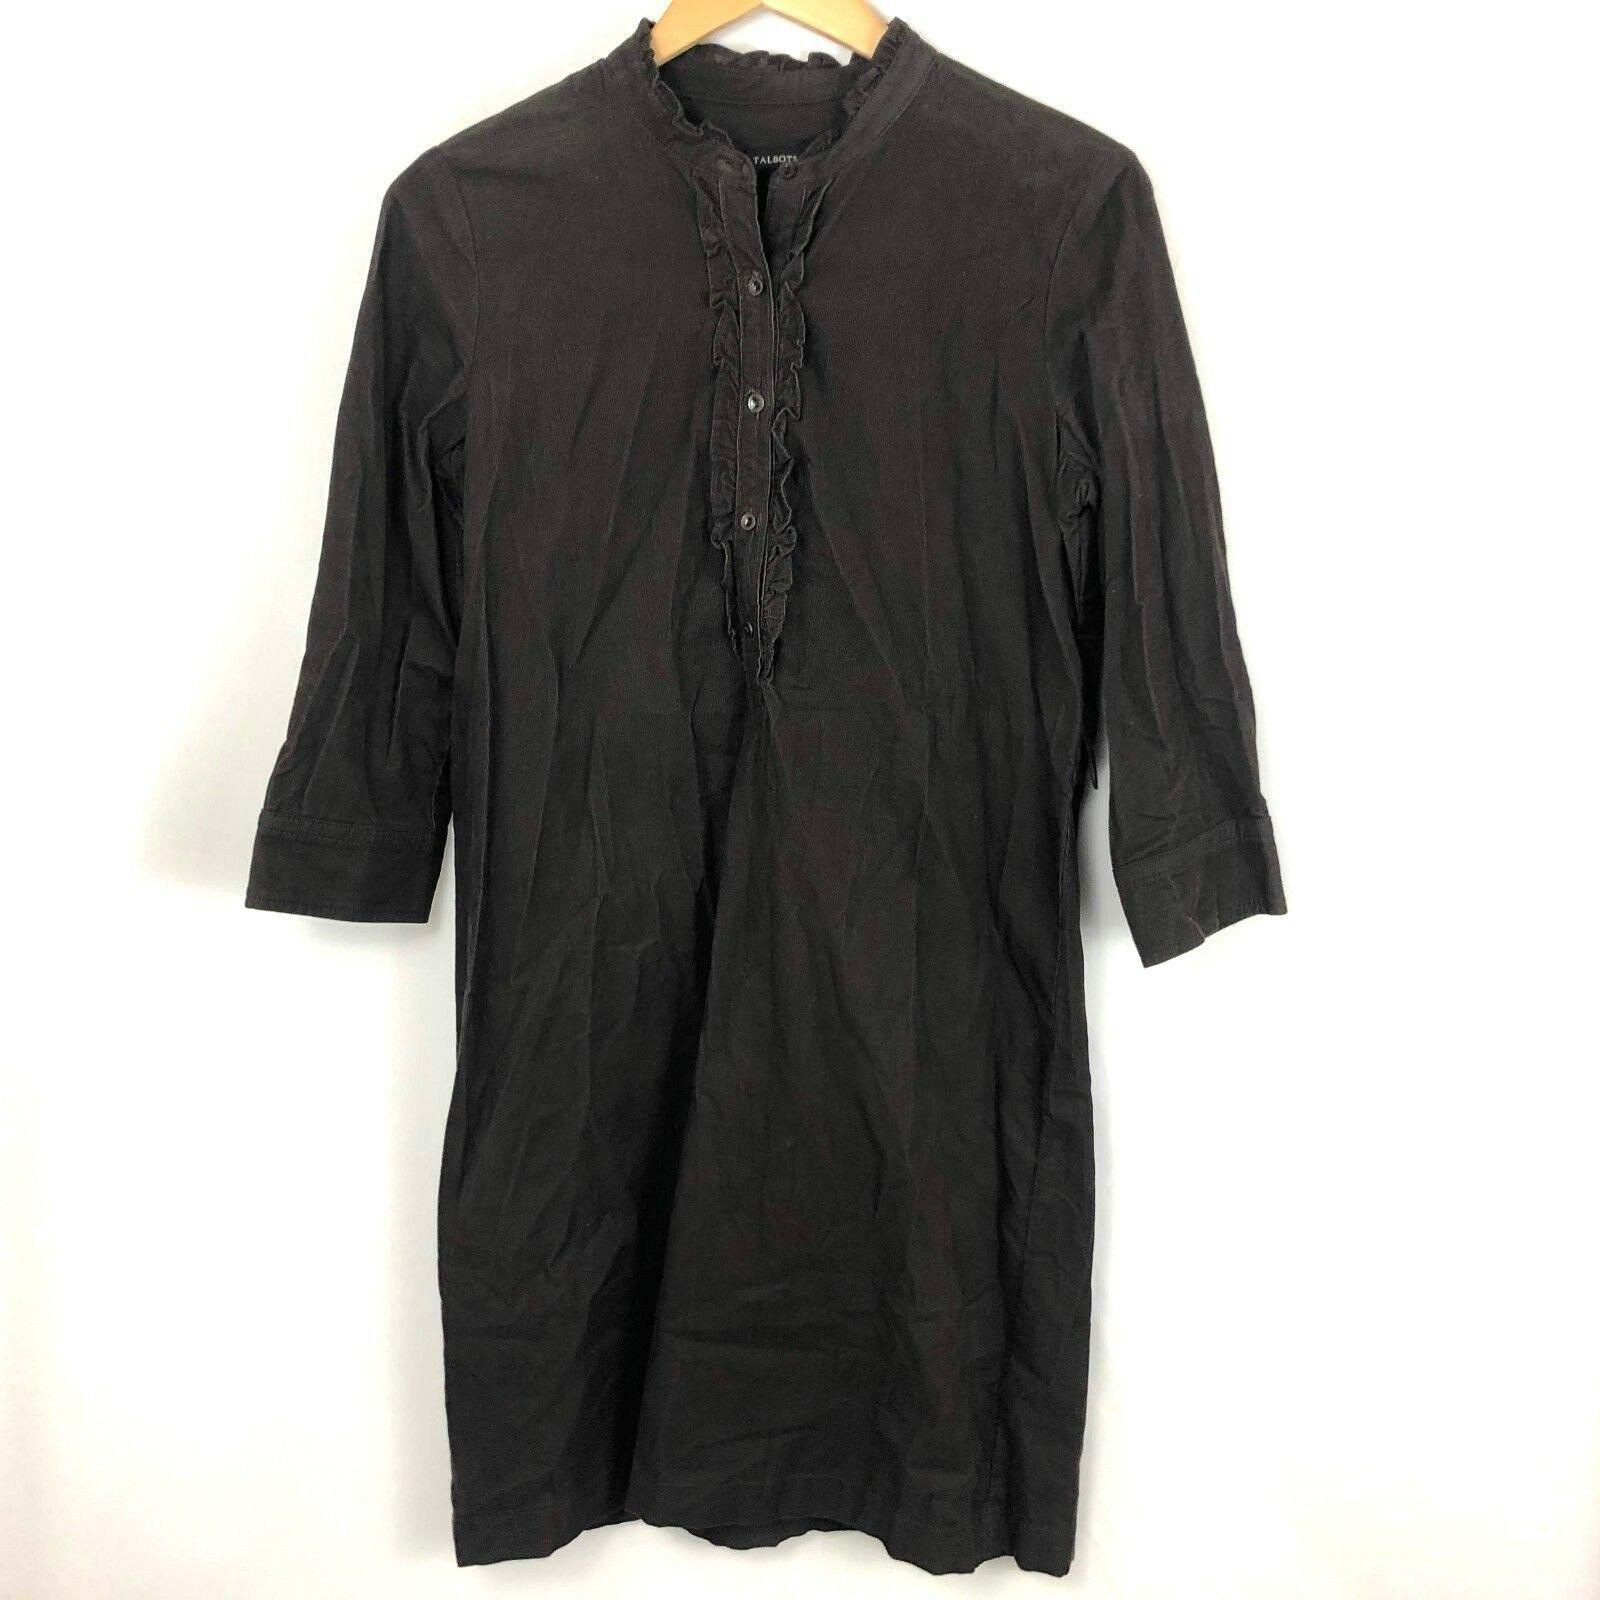 Talbots Sz 4 Corduroy Shirt Dress Brown Espresso Buttons Cotton Blend Ruffle